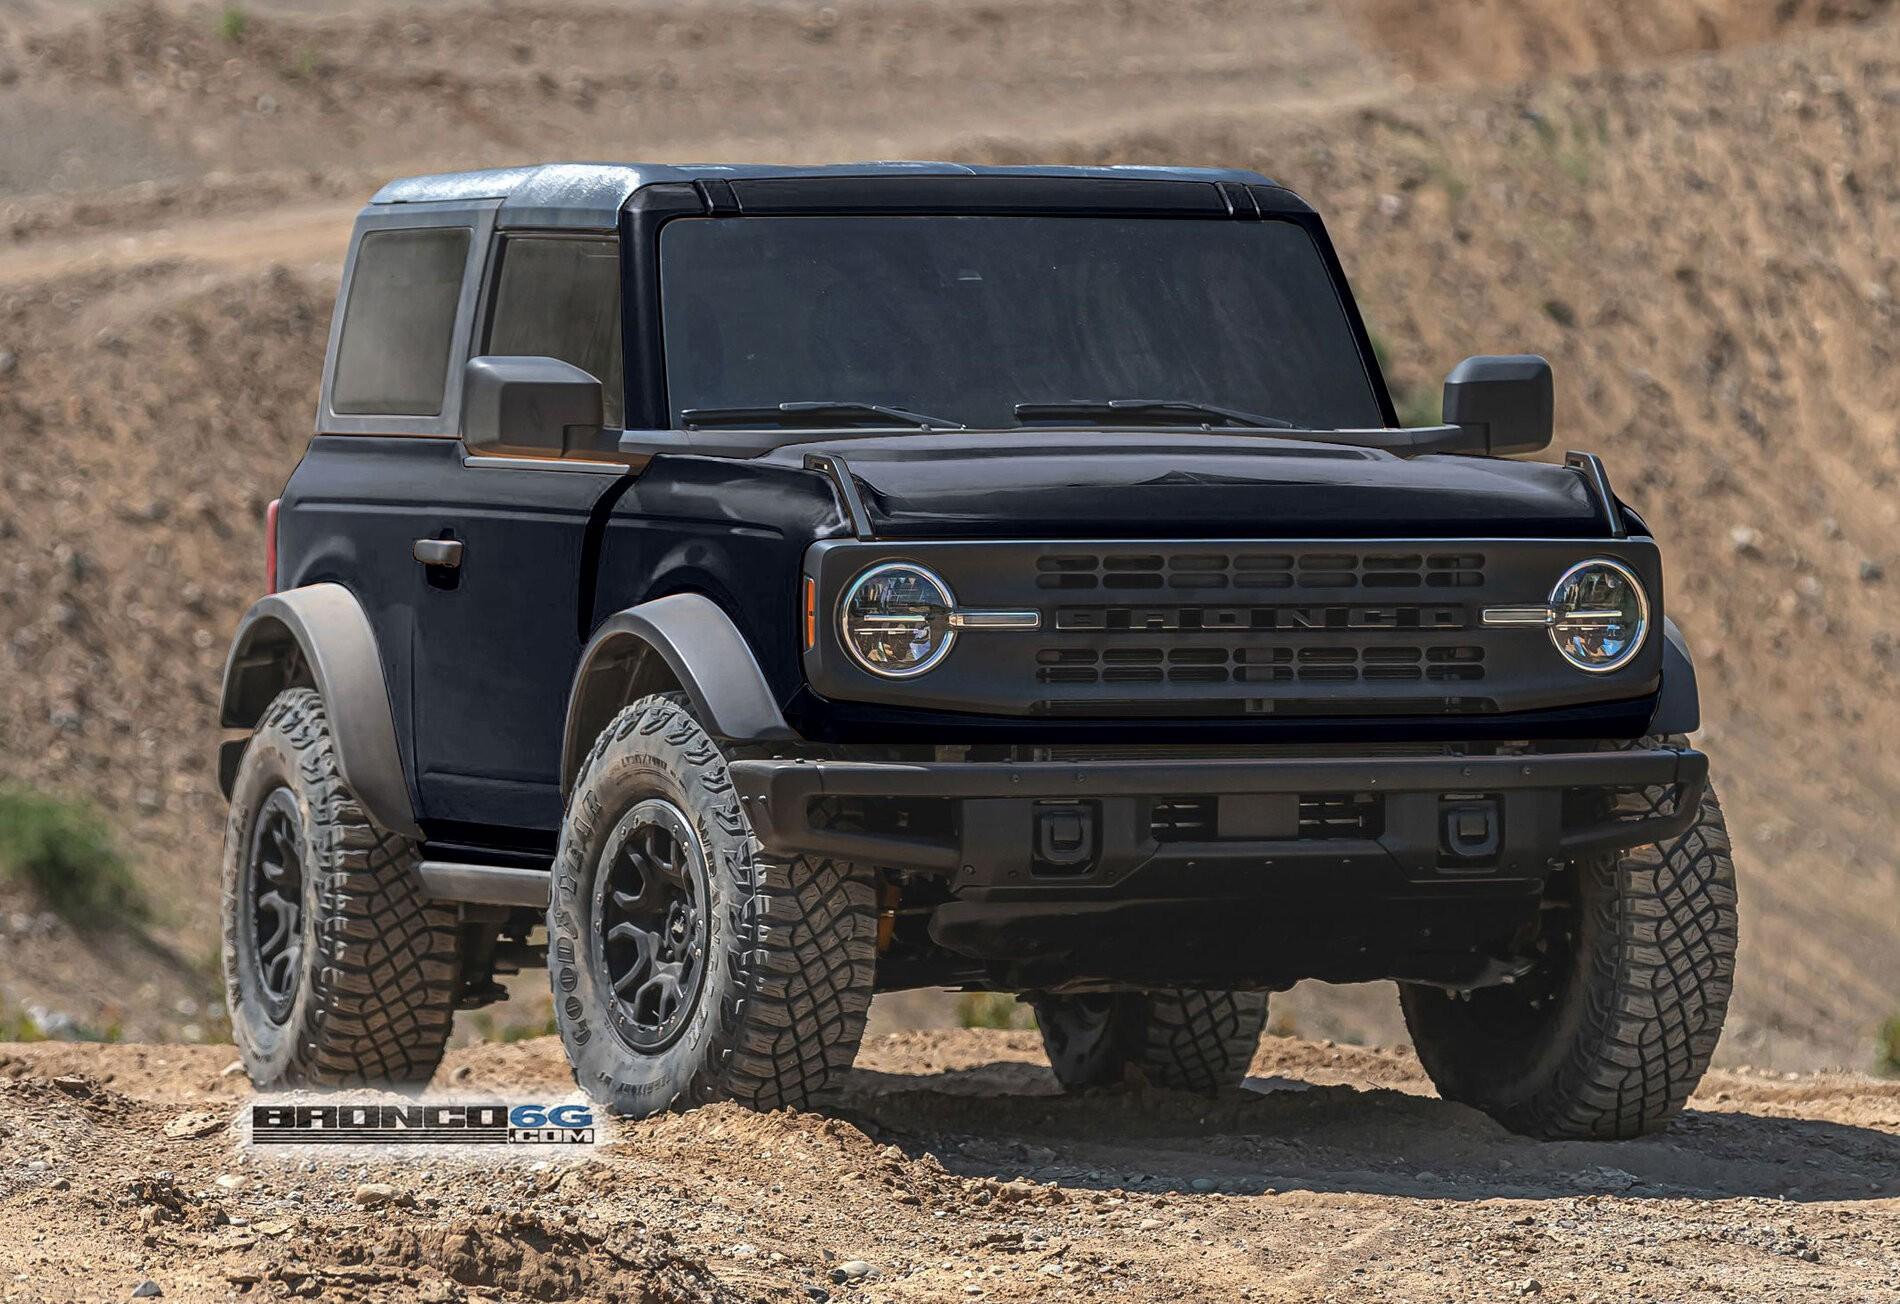 2021 Ford Bronco Sasquatch 2-Door Photoshop-Painted in ...